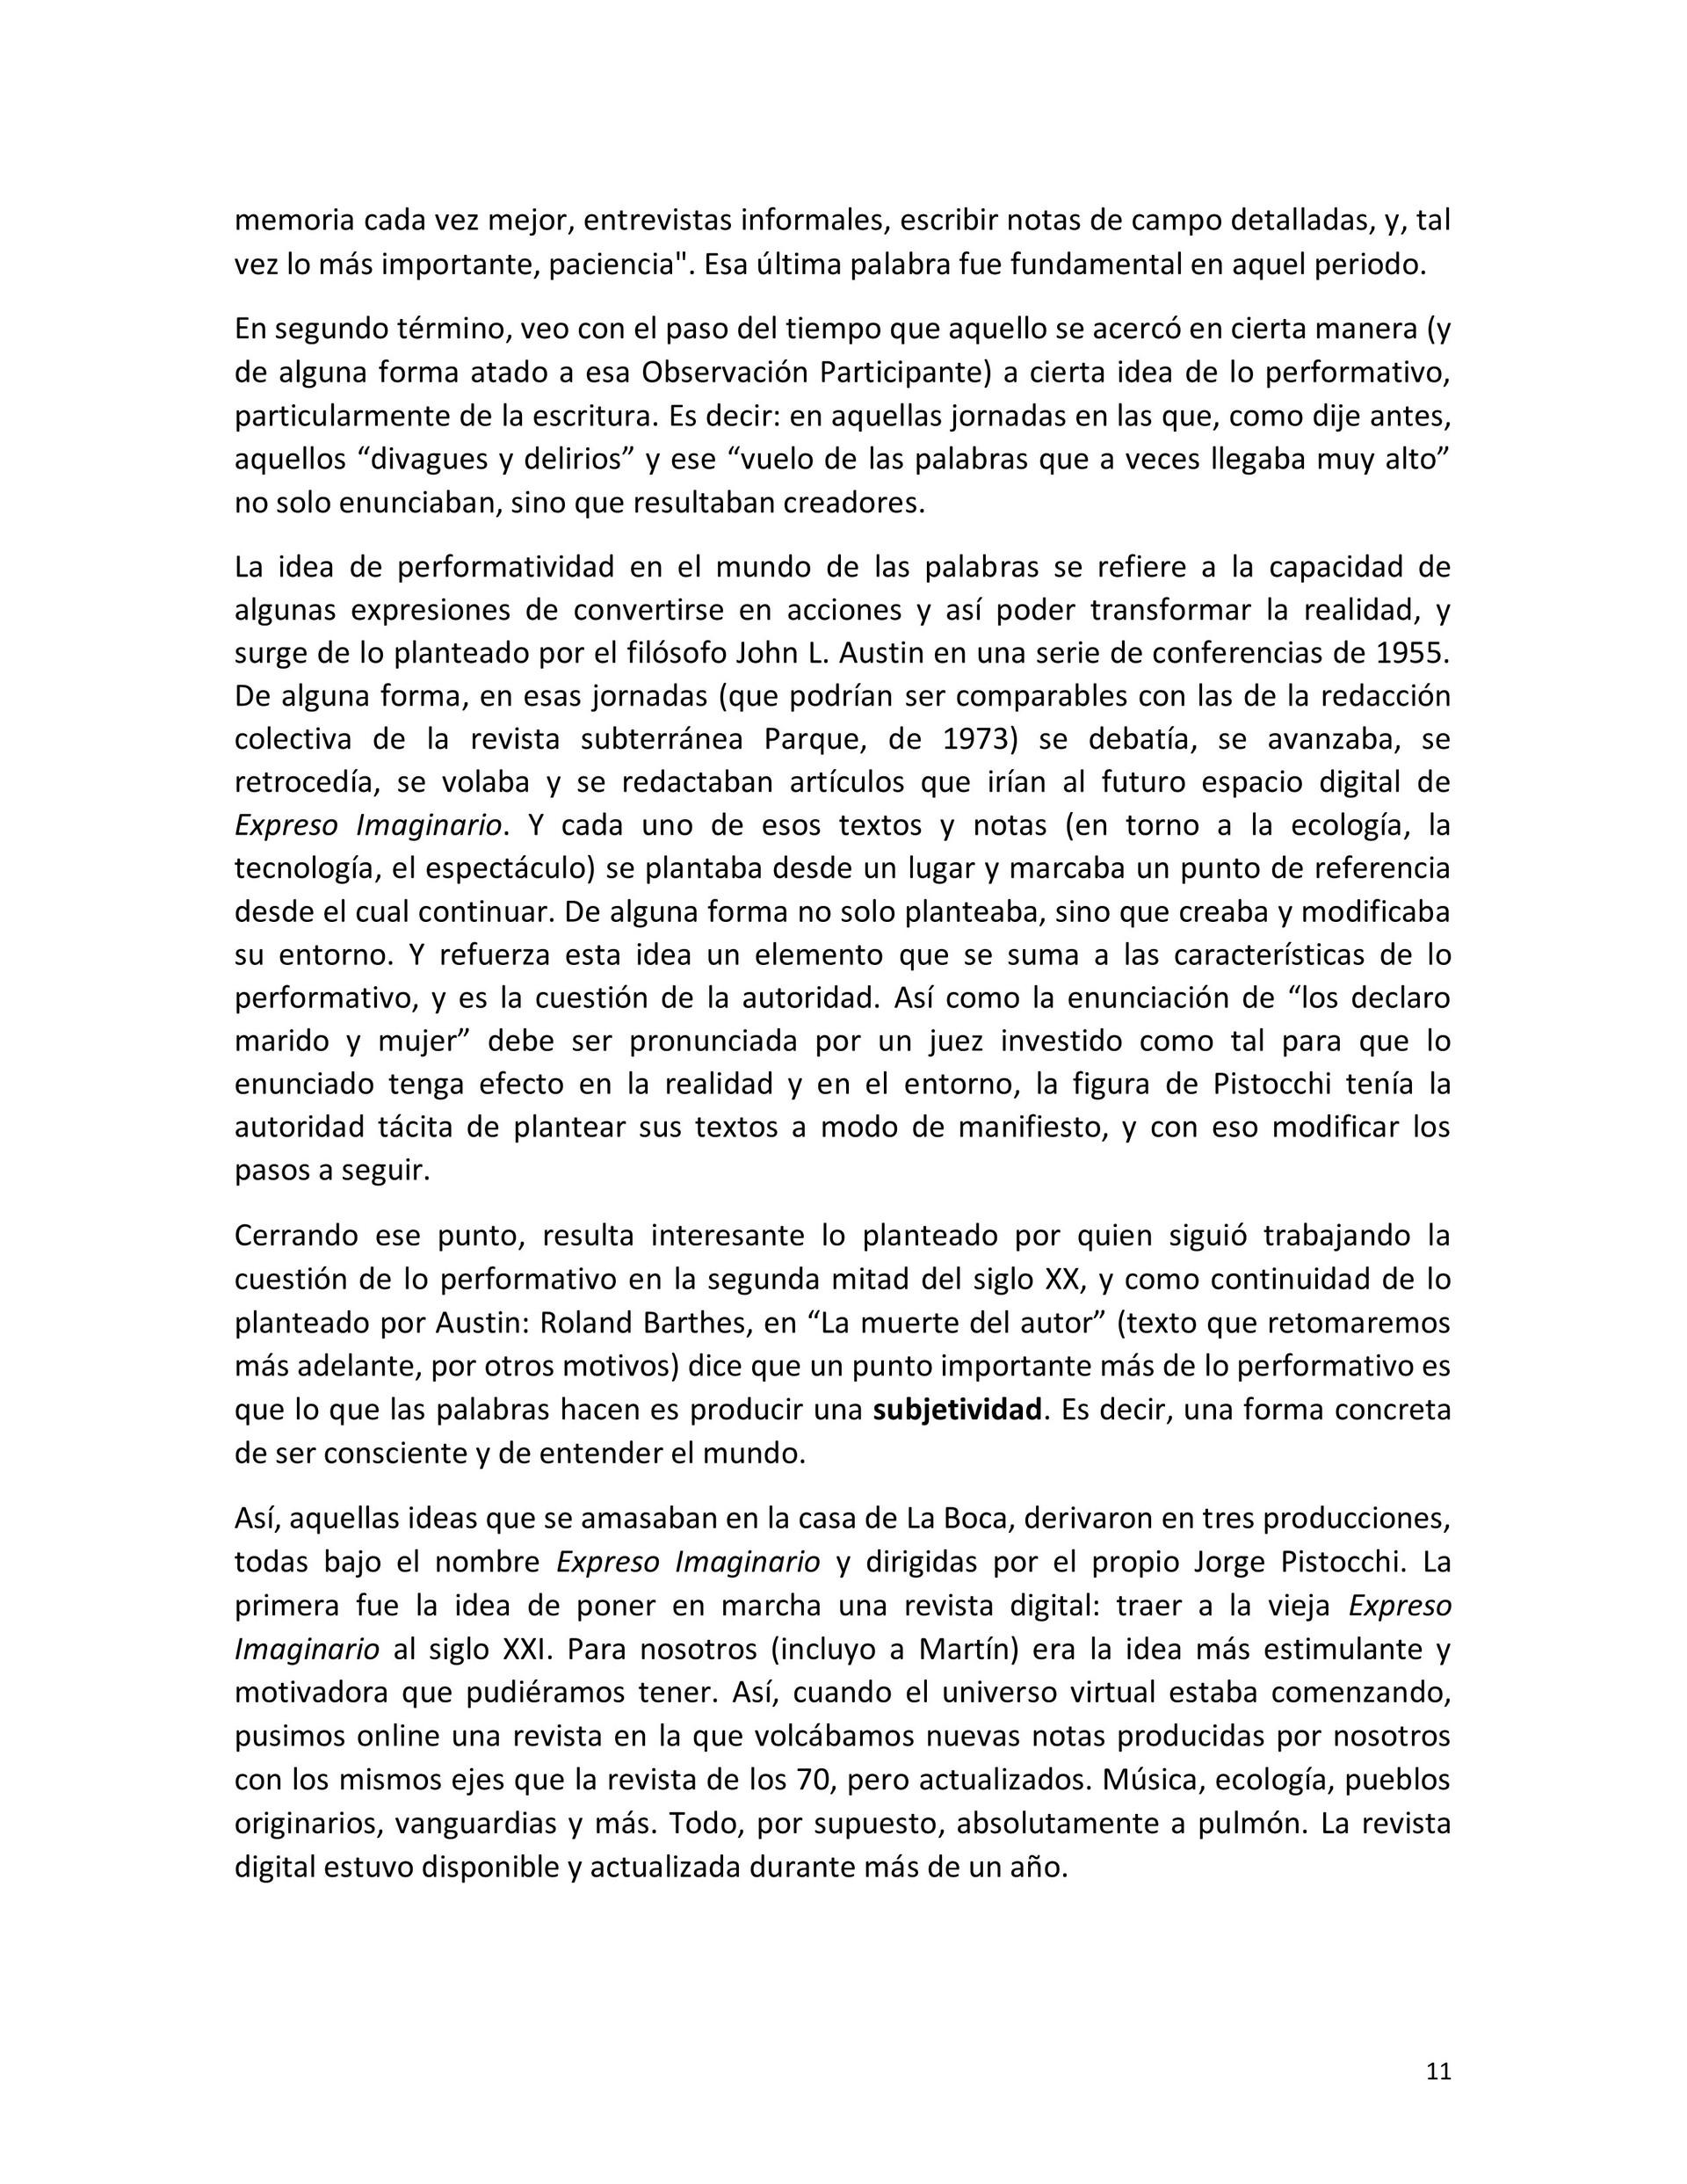 estacion_Page_10.jpeg